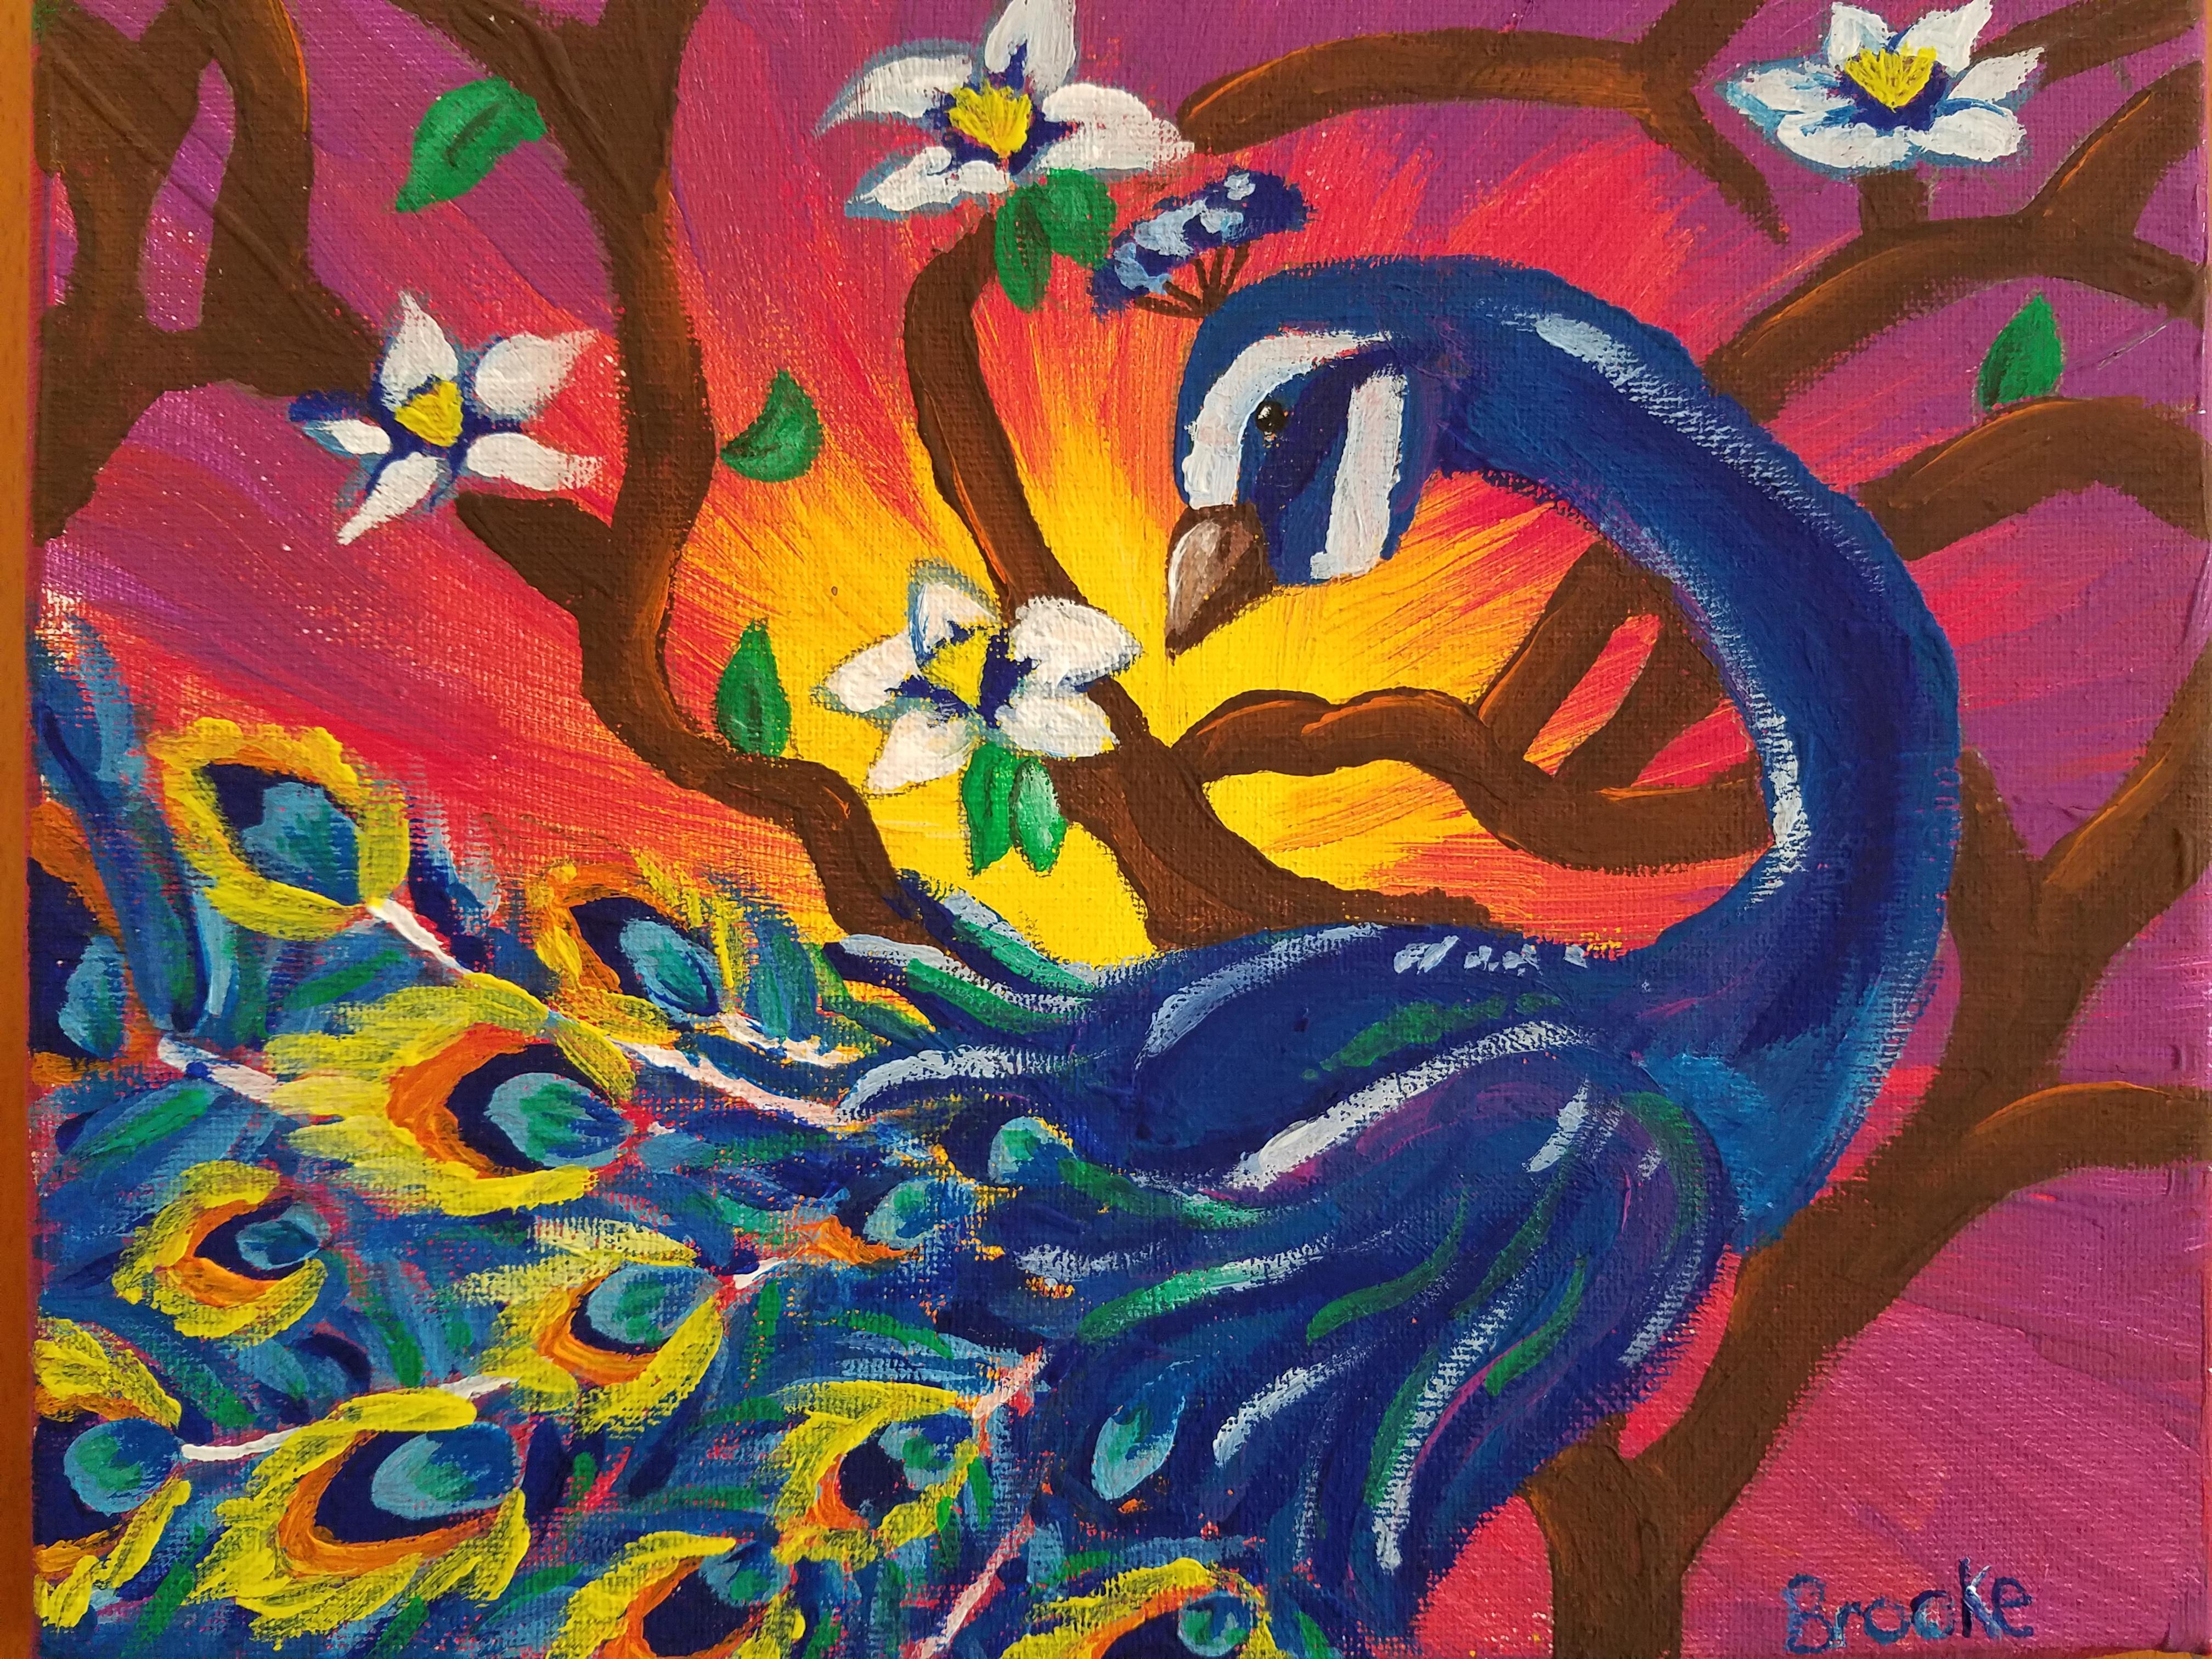 Peacock Art - Age 10